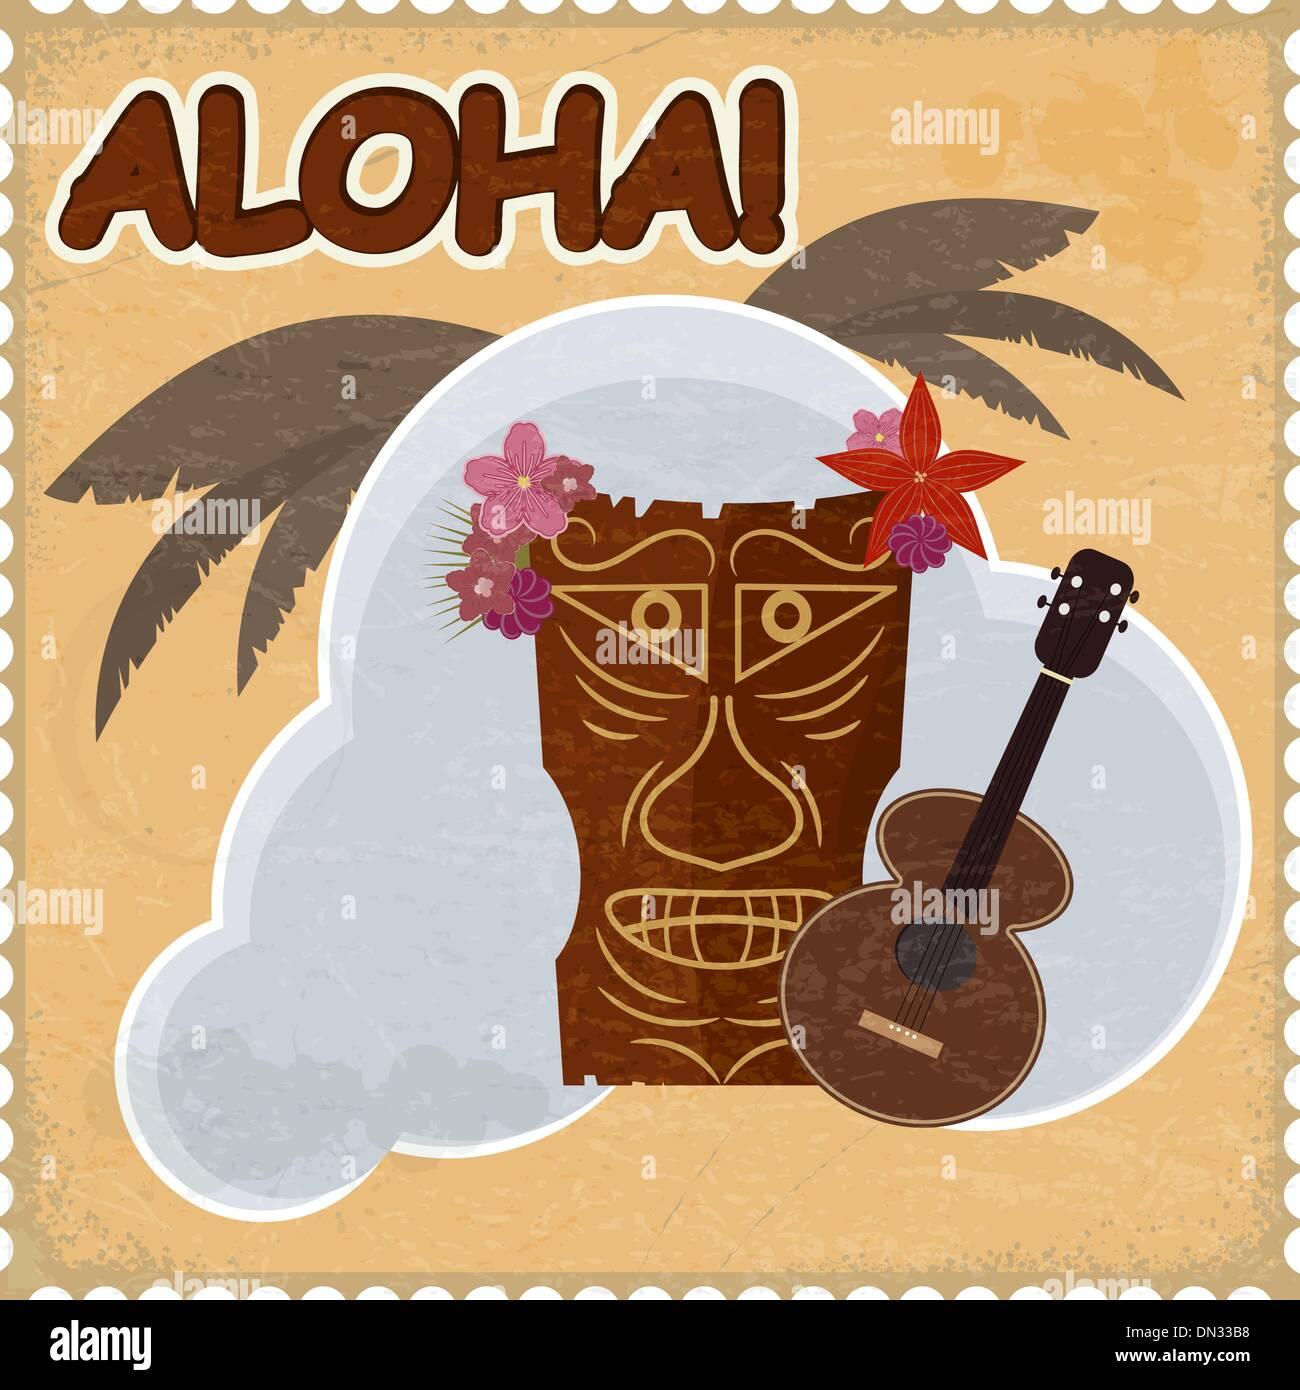 Vintage postcard with Hawaiian elements. eps10 - Stock Vector